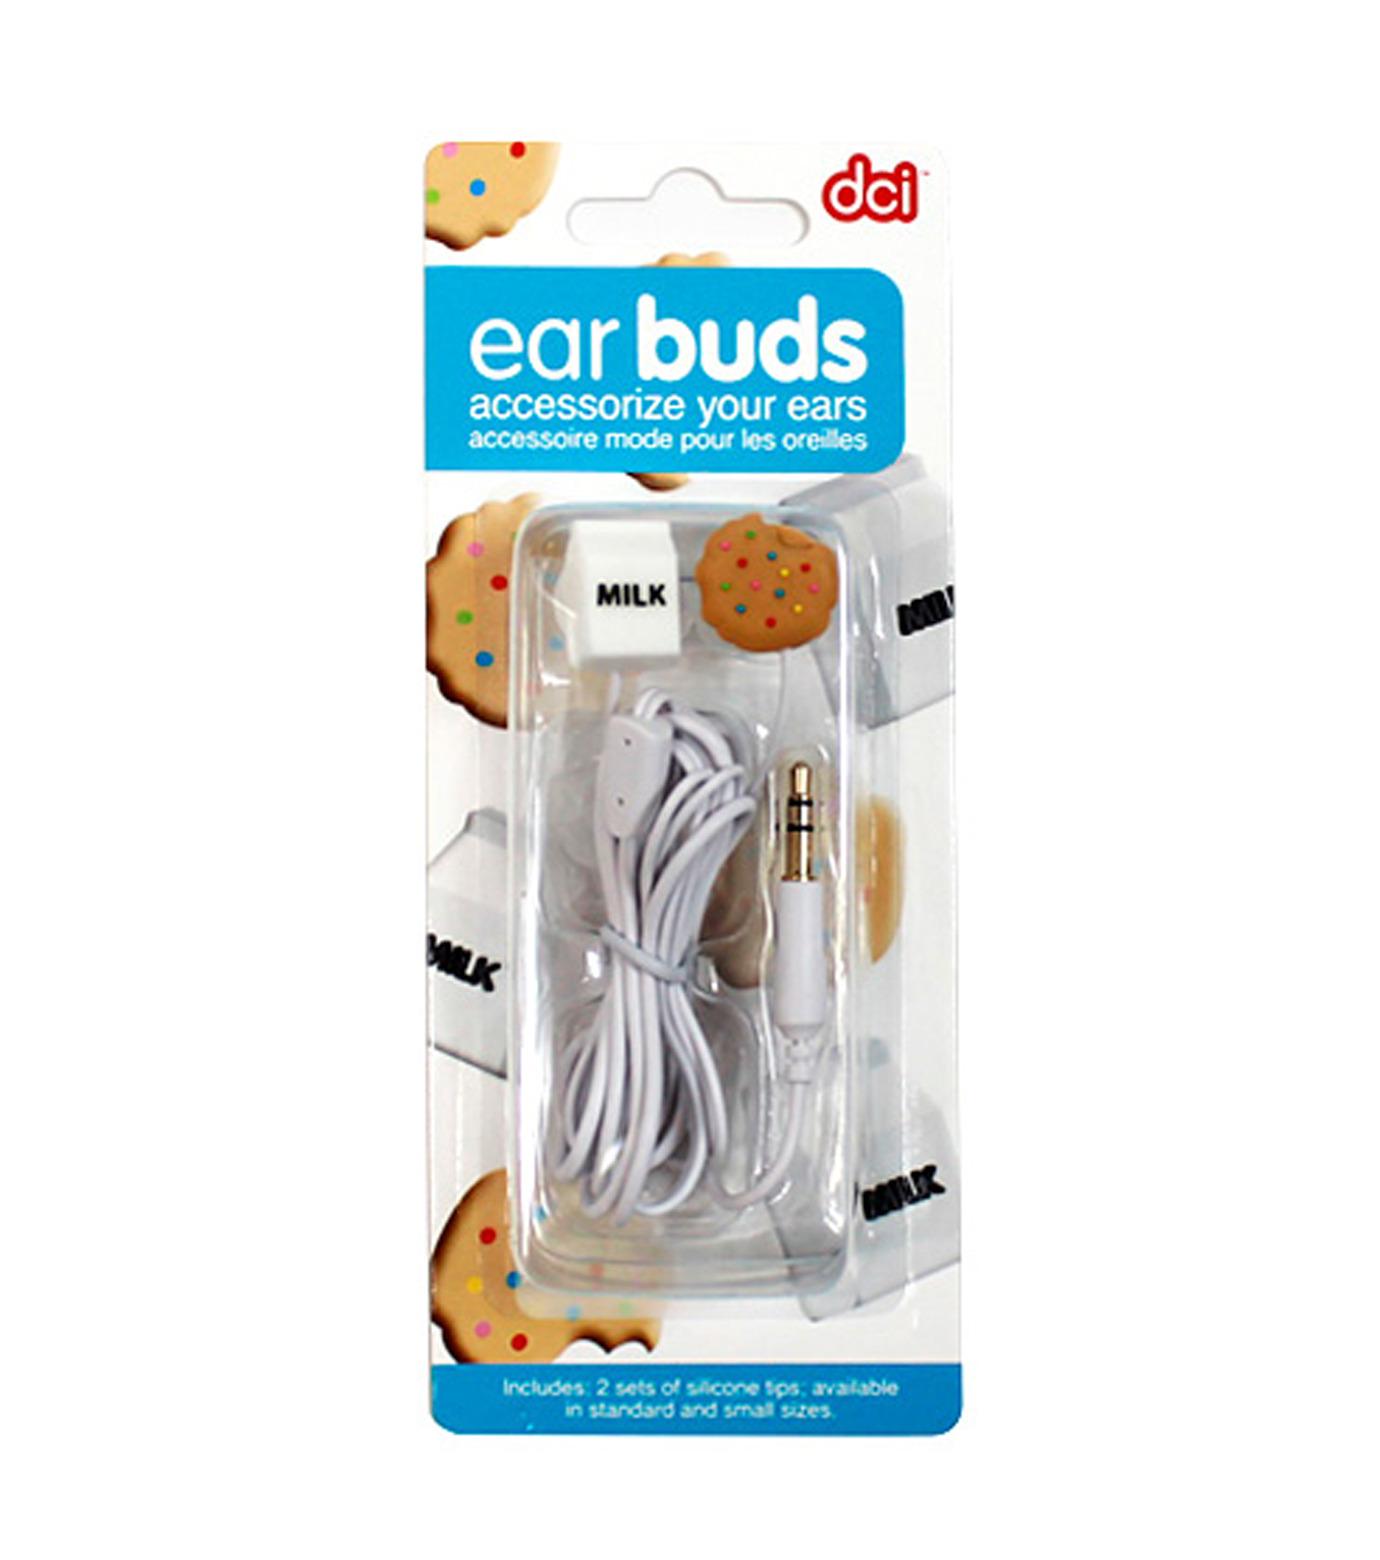 DCI(ディーシーアイ)のEarbuds Milk & Cookies-MULTI COLOUR(アザーズ/EARPHONE/others/EARPHONE)-38129-9 拡大詳細画像2